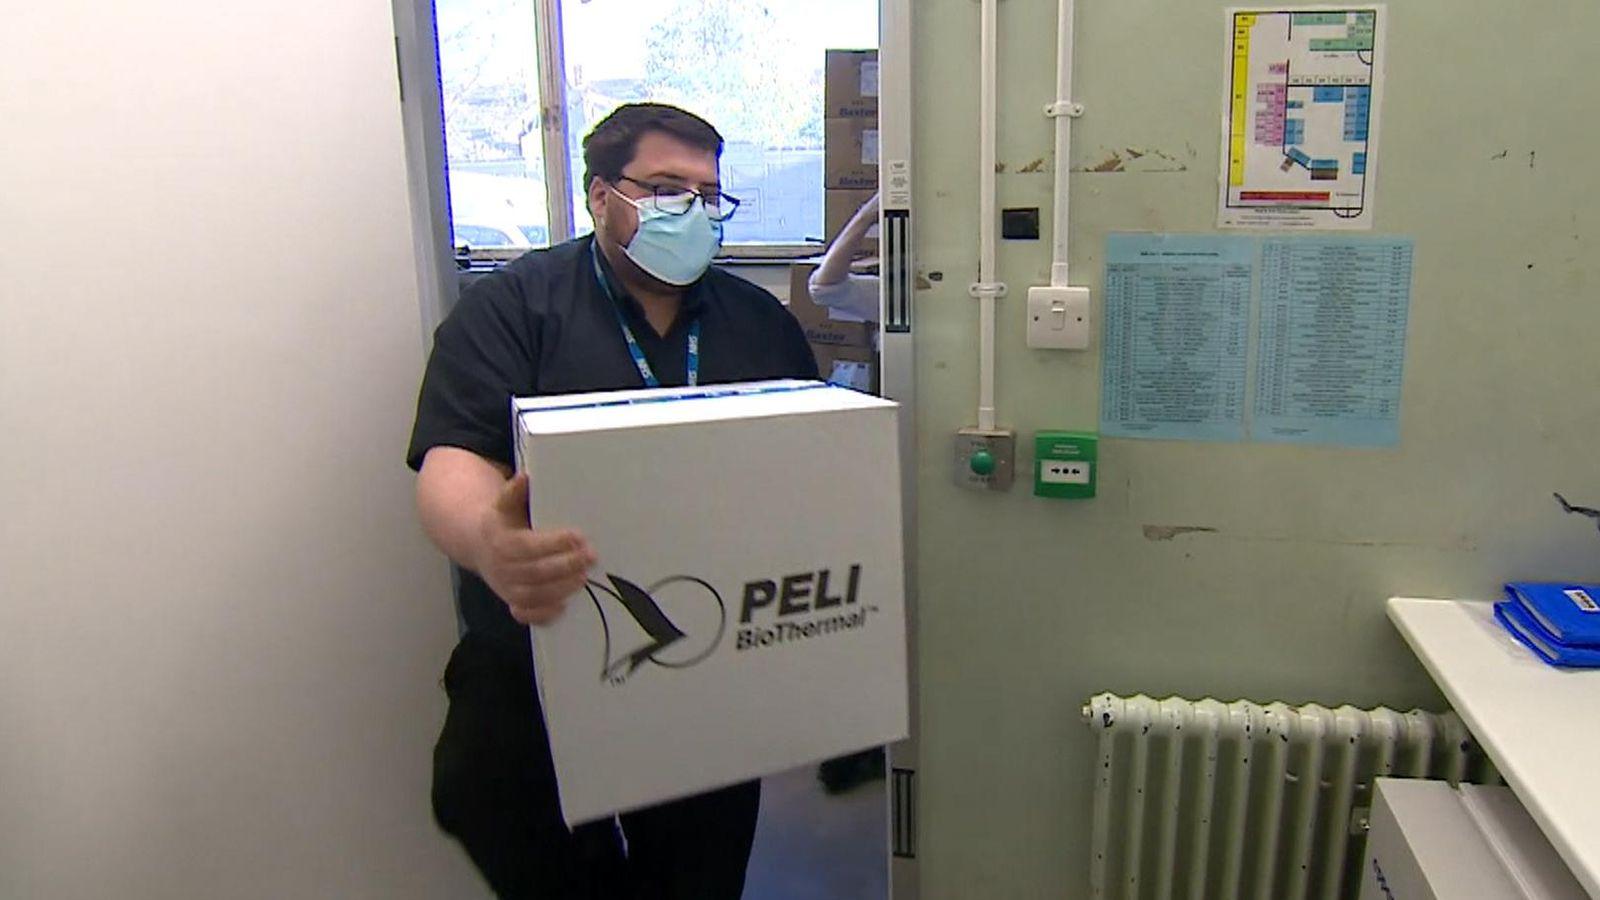 United Kingdom to start coronavirus vaccinations on Tuesday